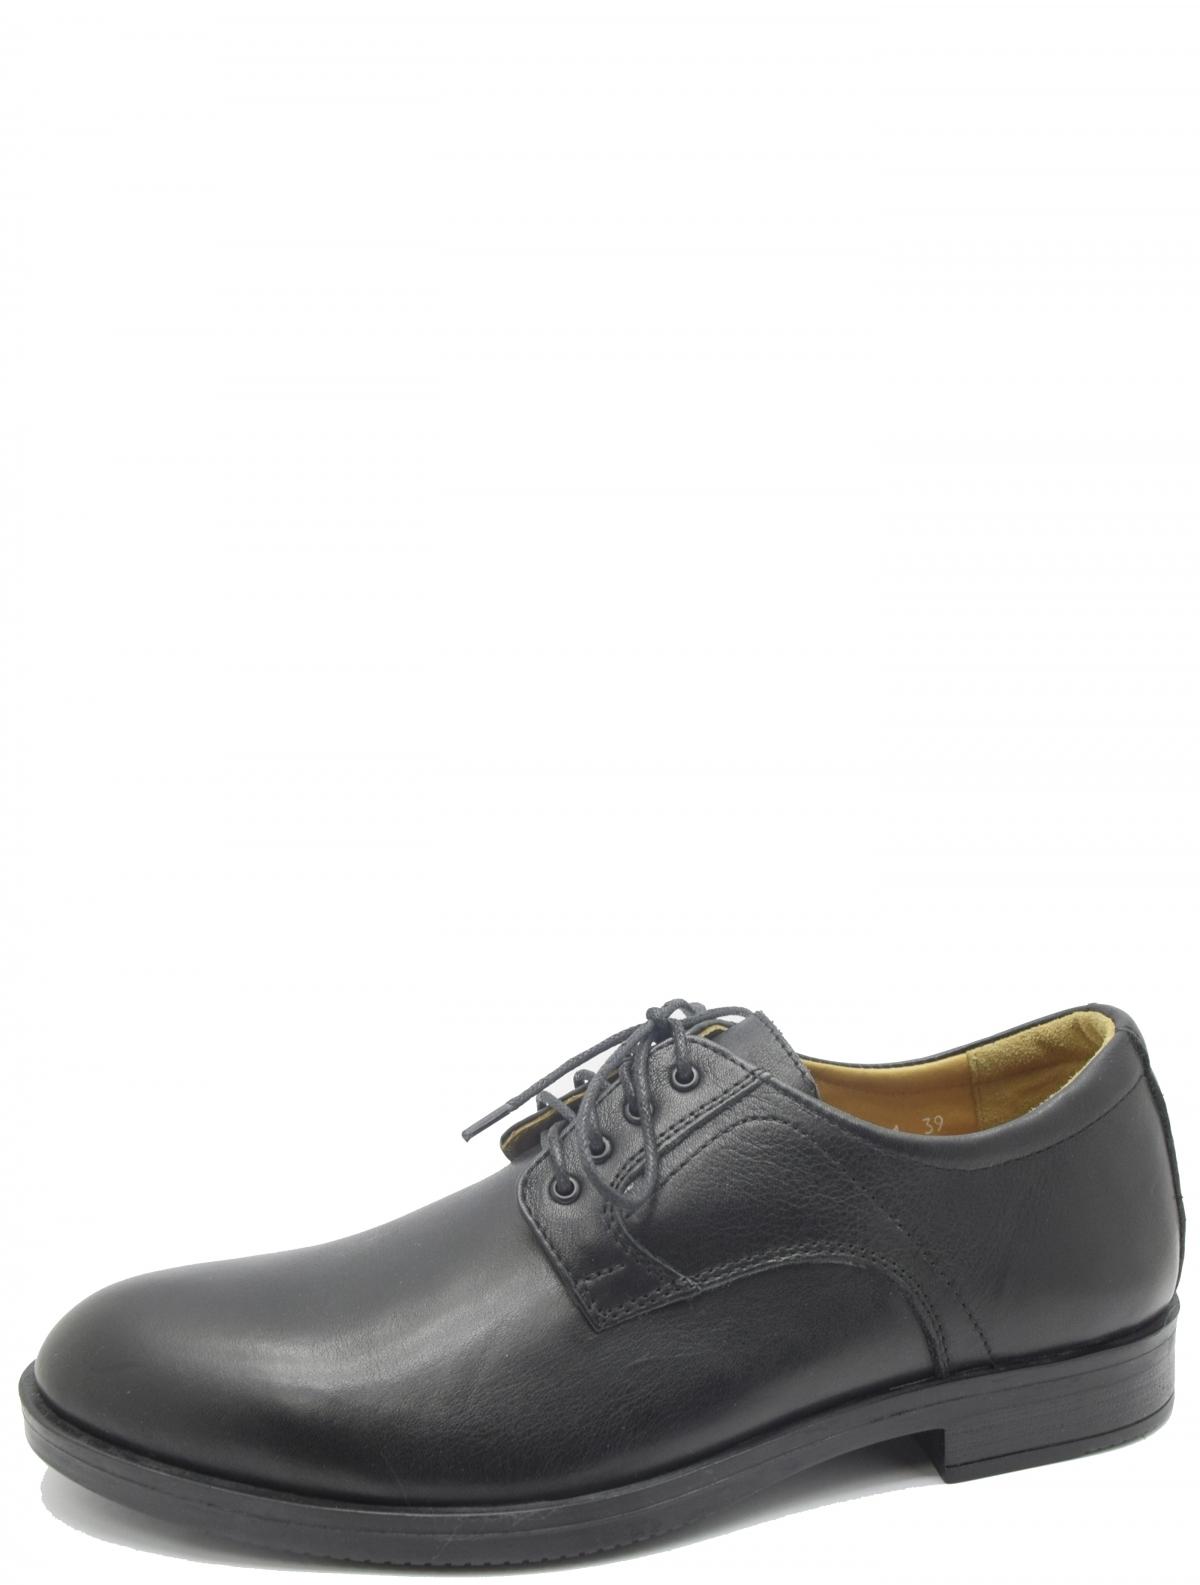 Bossner 1-271-103-1 мужские туфли